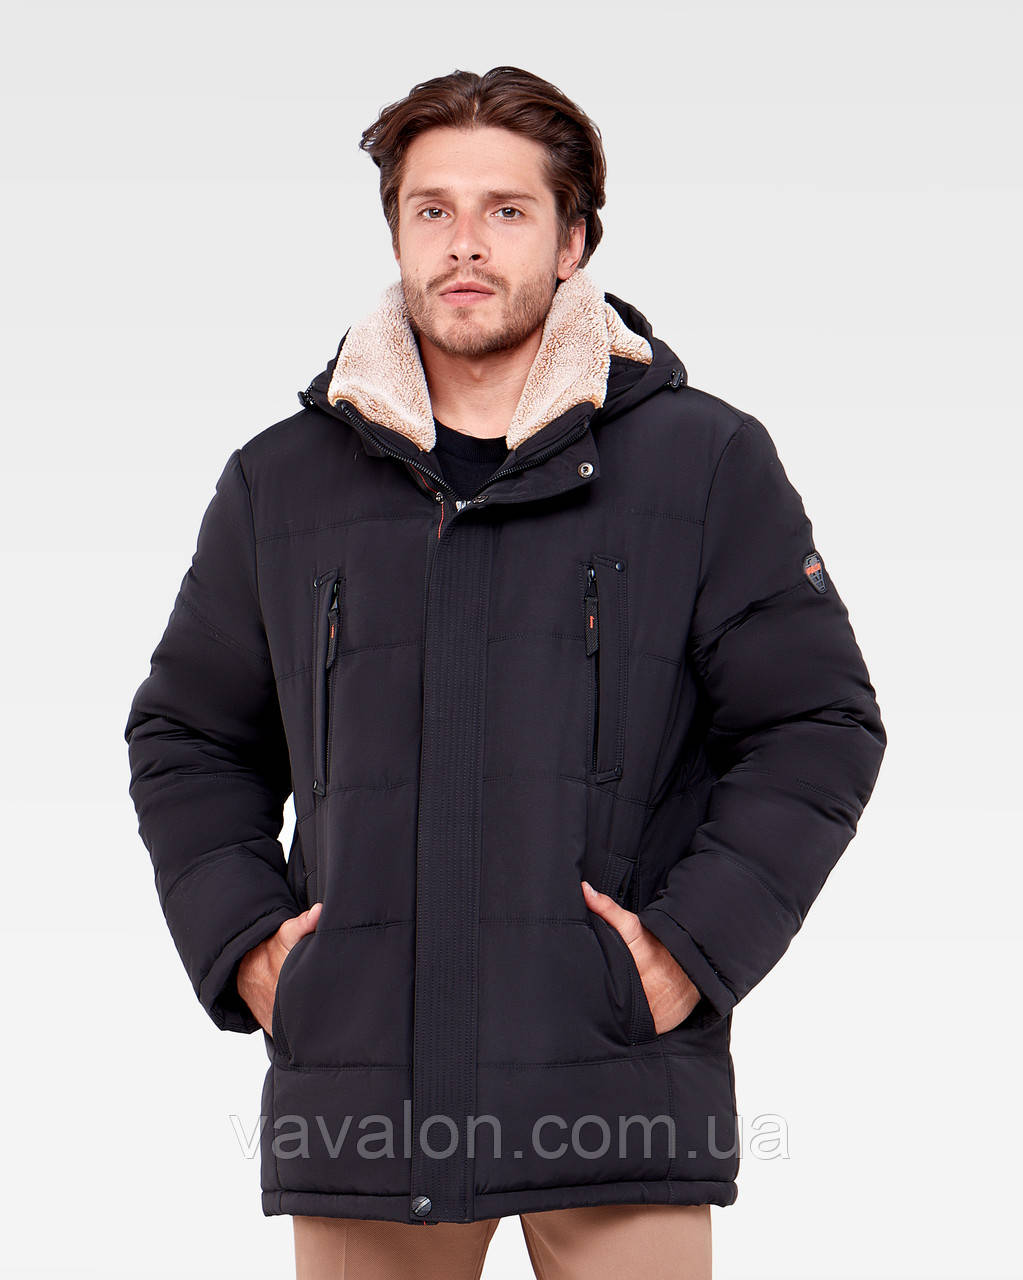 Зимняя мужская куртка Vavalon KZ-938 black